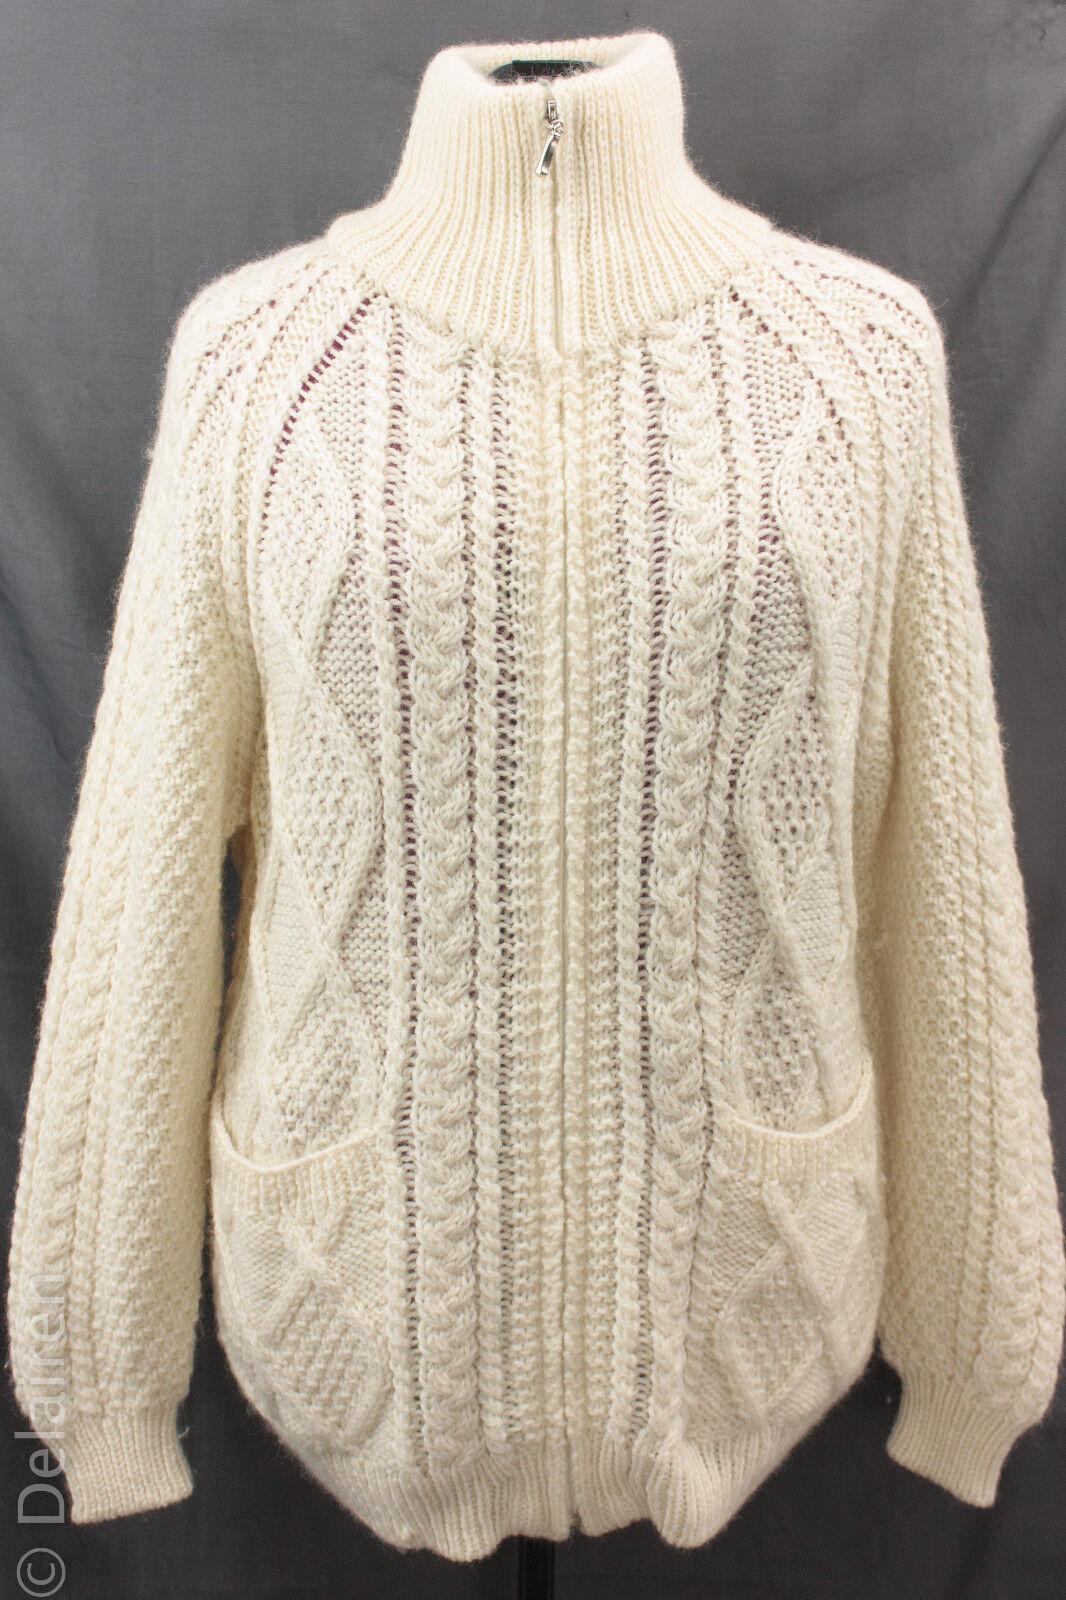 Aran Crafts 100% Merino Wool Irish CableKnit Chunky Fishermens FullZip Sweater M